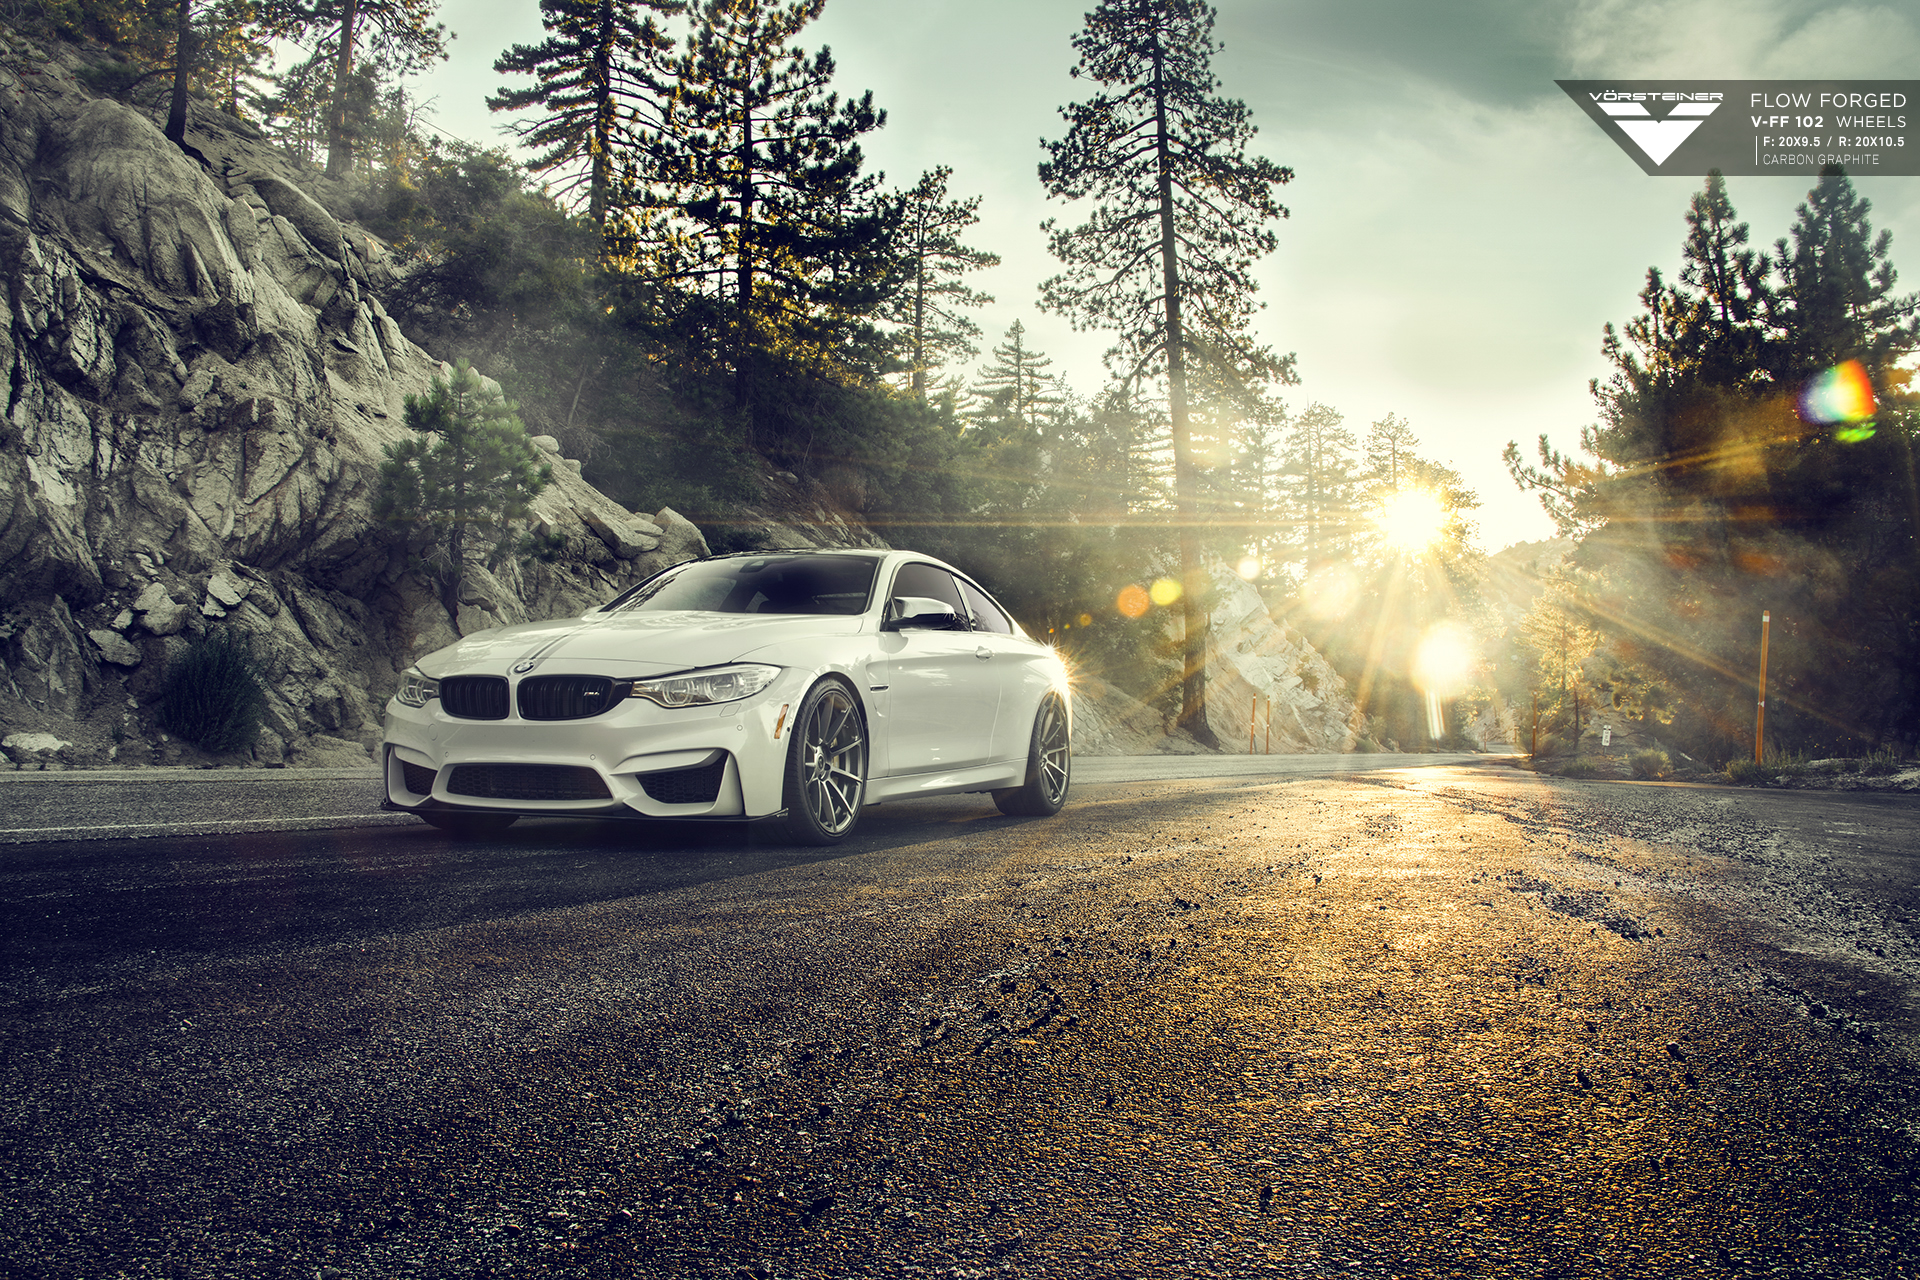 BMW F82 M4 With Vorsteiner Flow Forged V-FF 102 Wheels